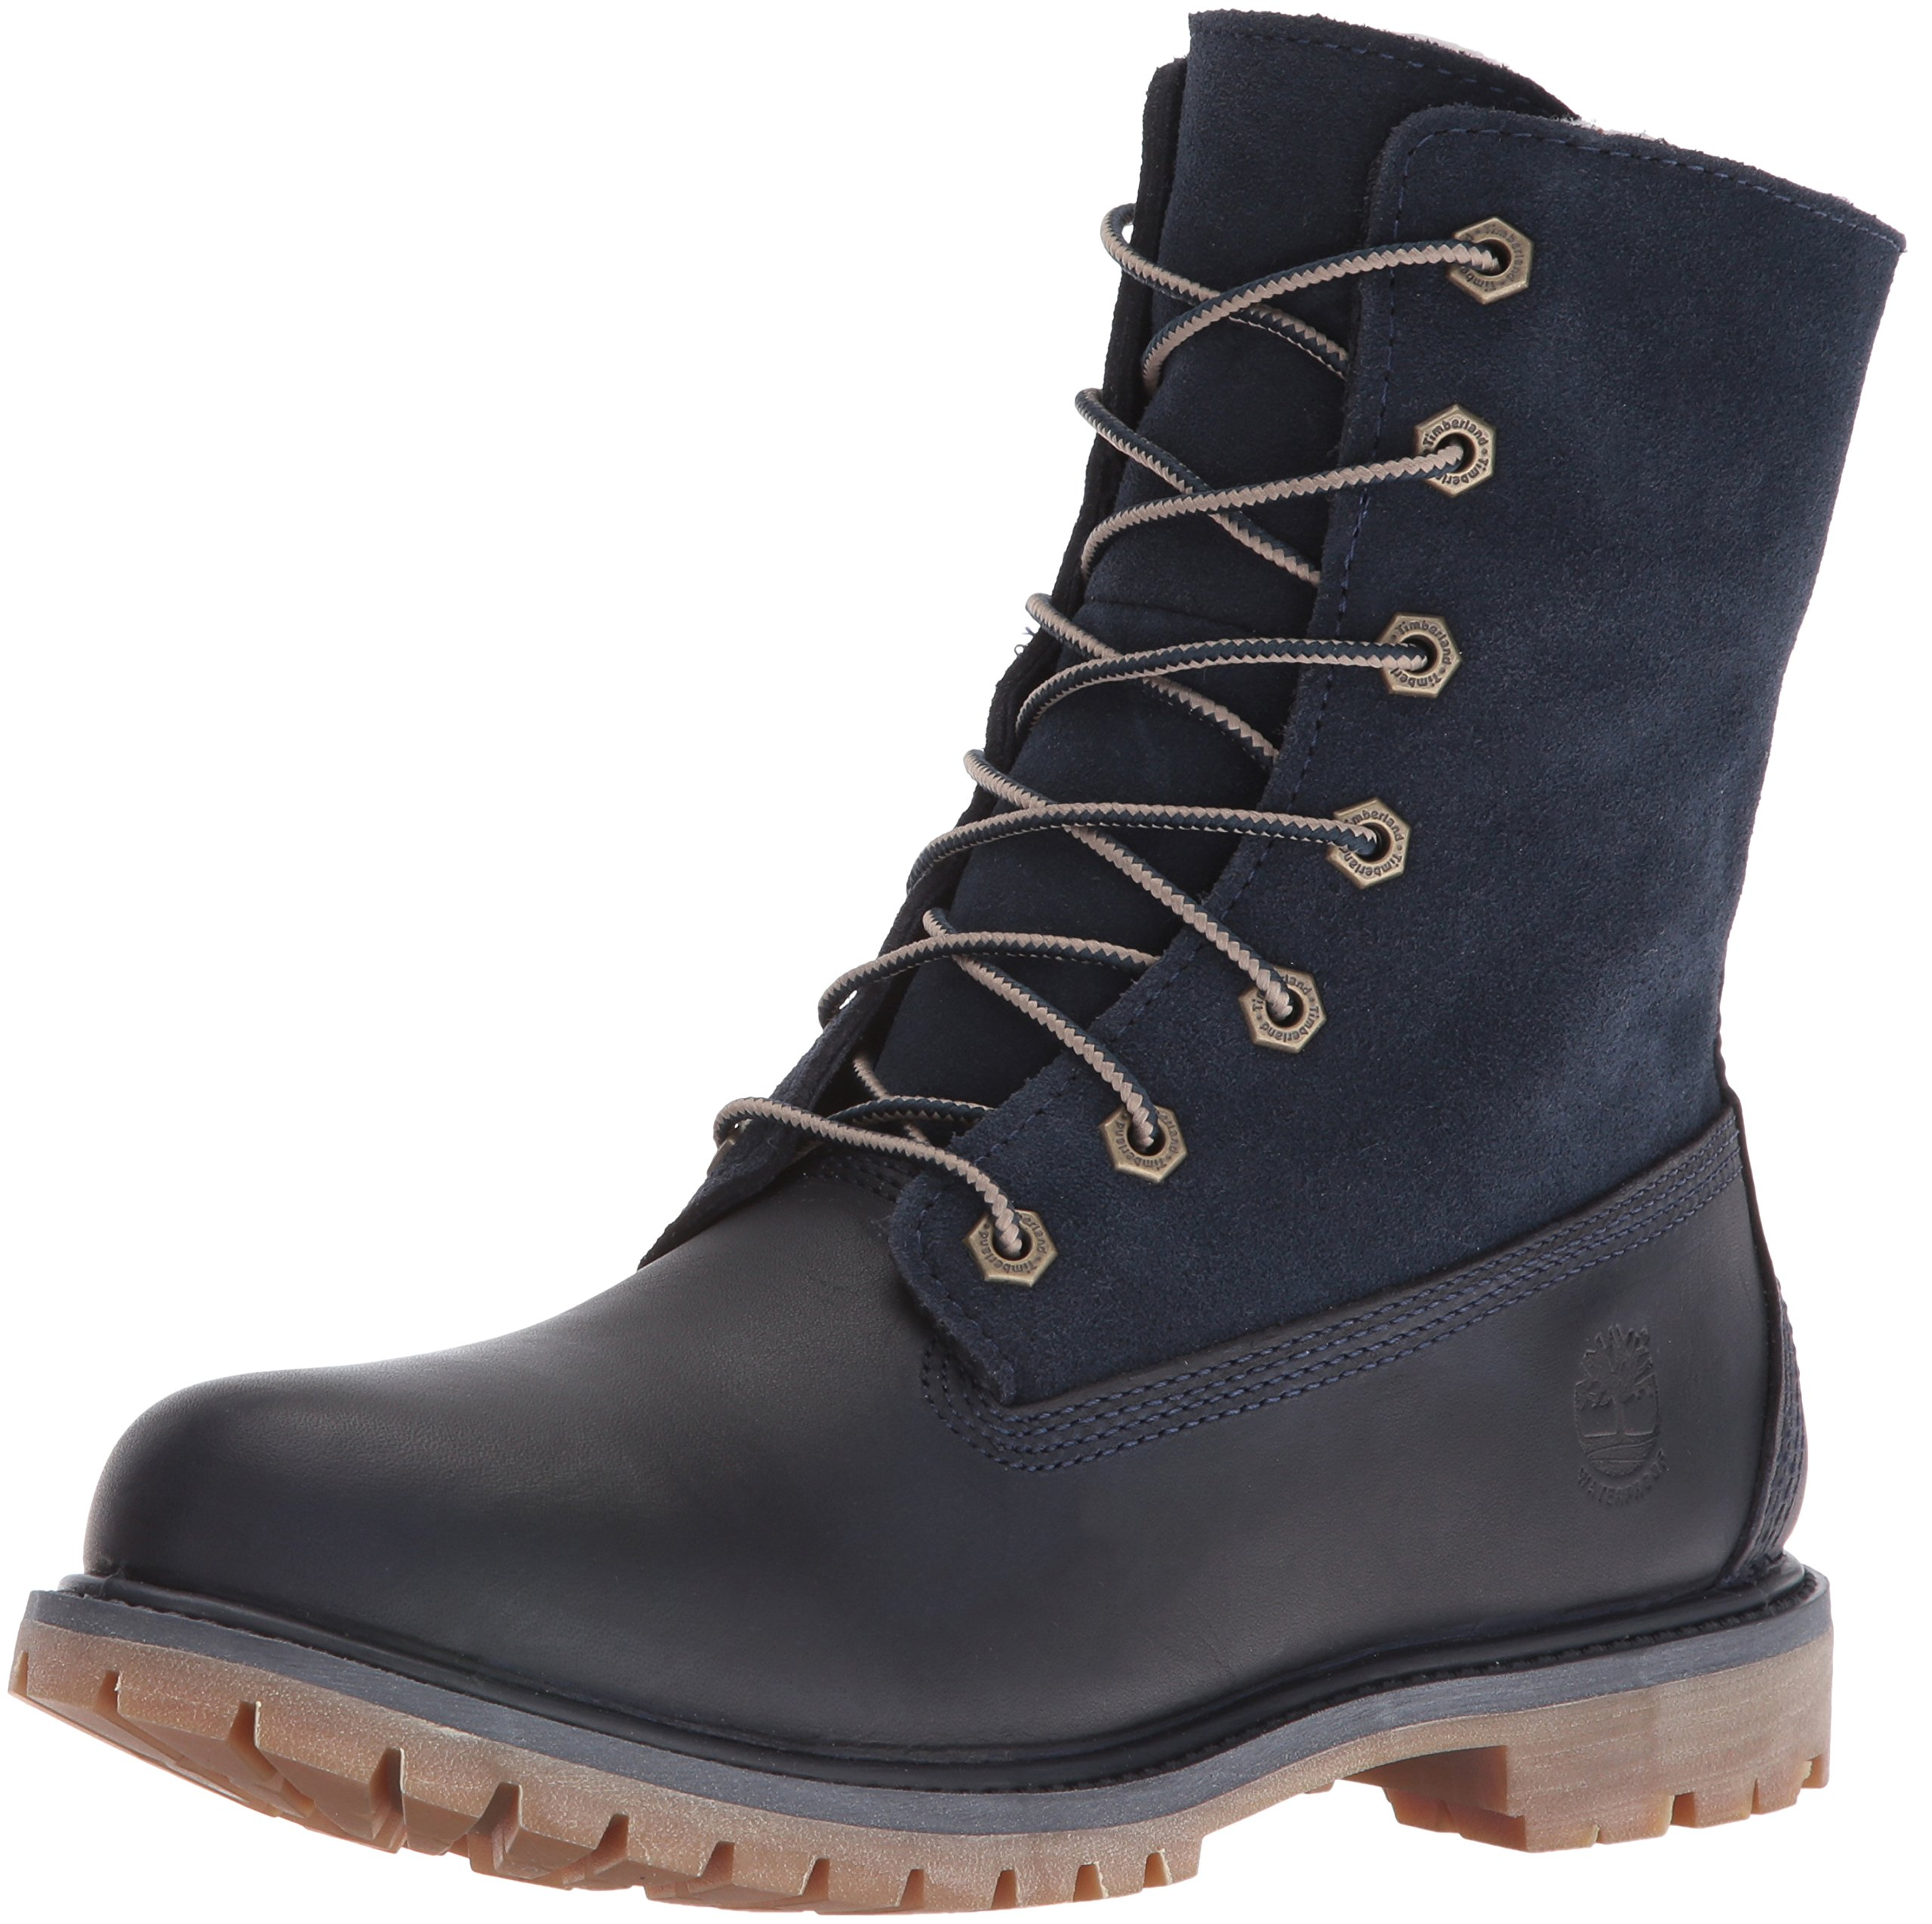 Timberland Women's Authentics Teddy Fleece WP Fold-Down Boot, Dark blue, 7.5 M US